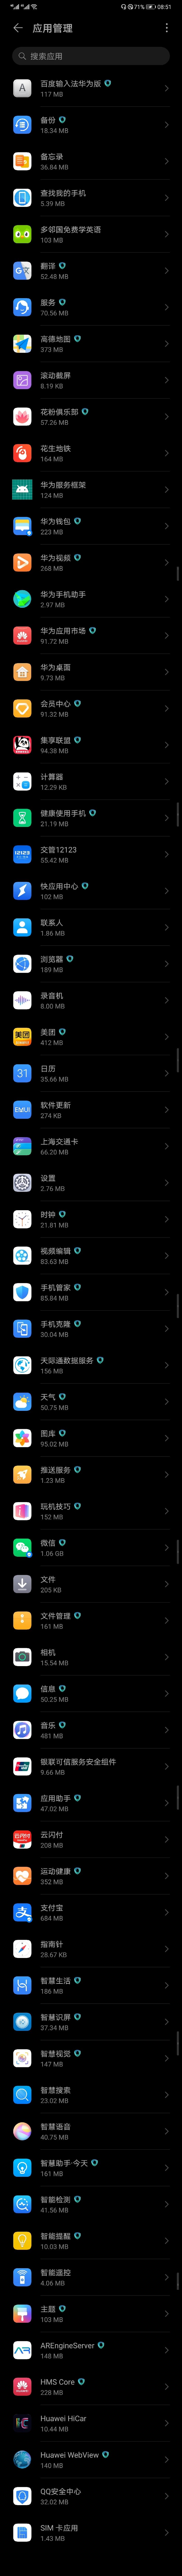 Screenshot_20200508_085119_com.android.settings.jpg